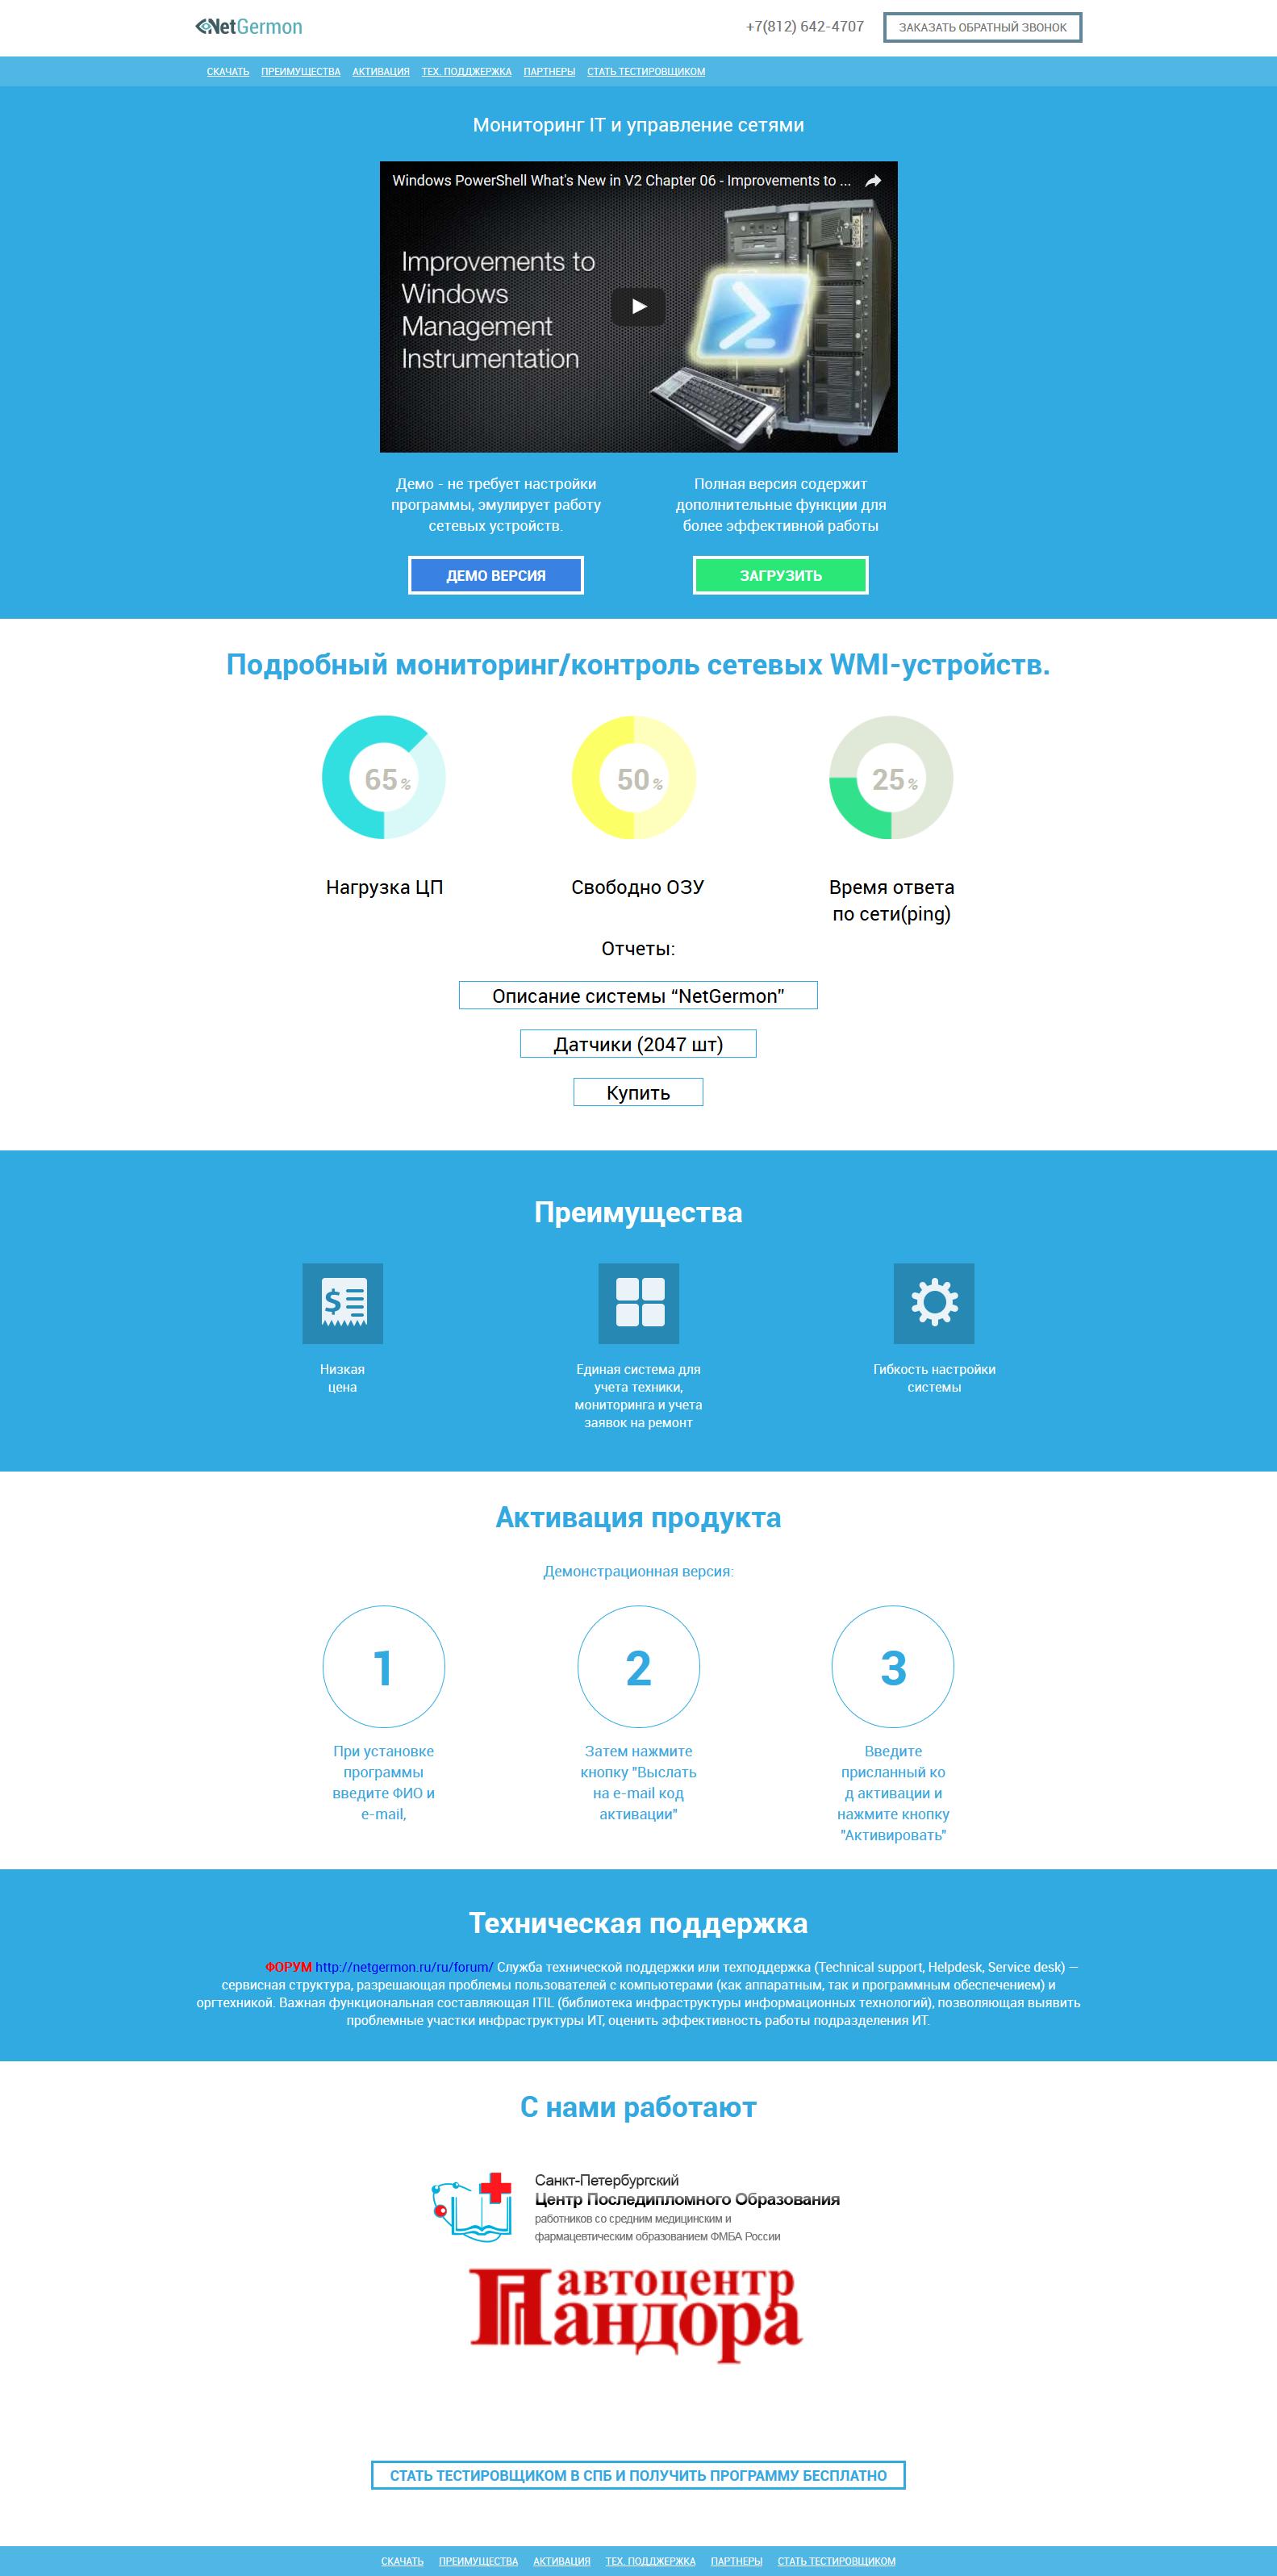 NetGermon - Мониторинг IT